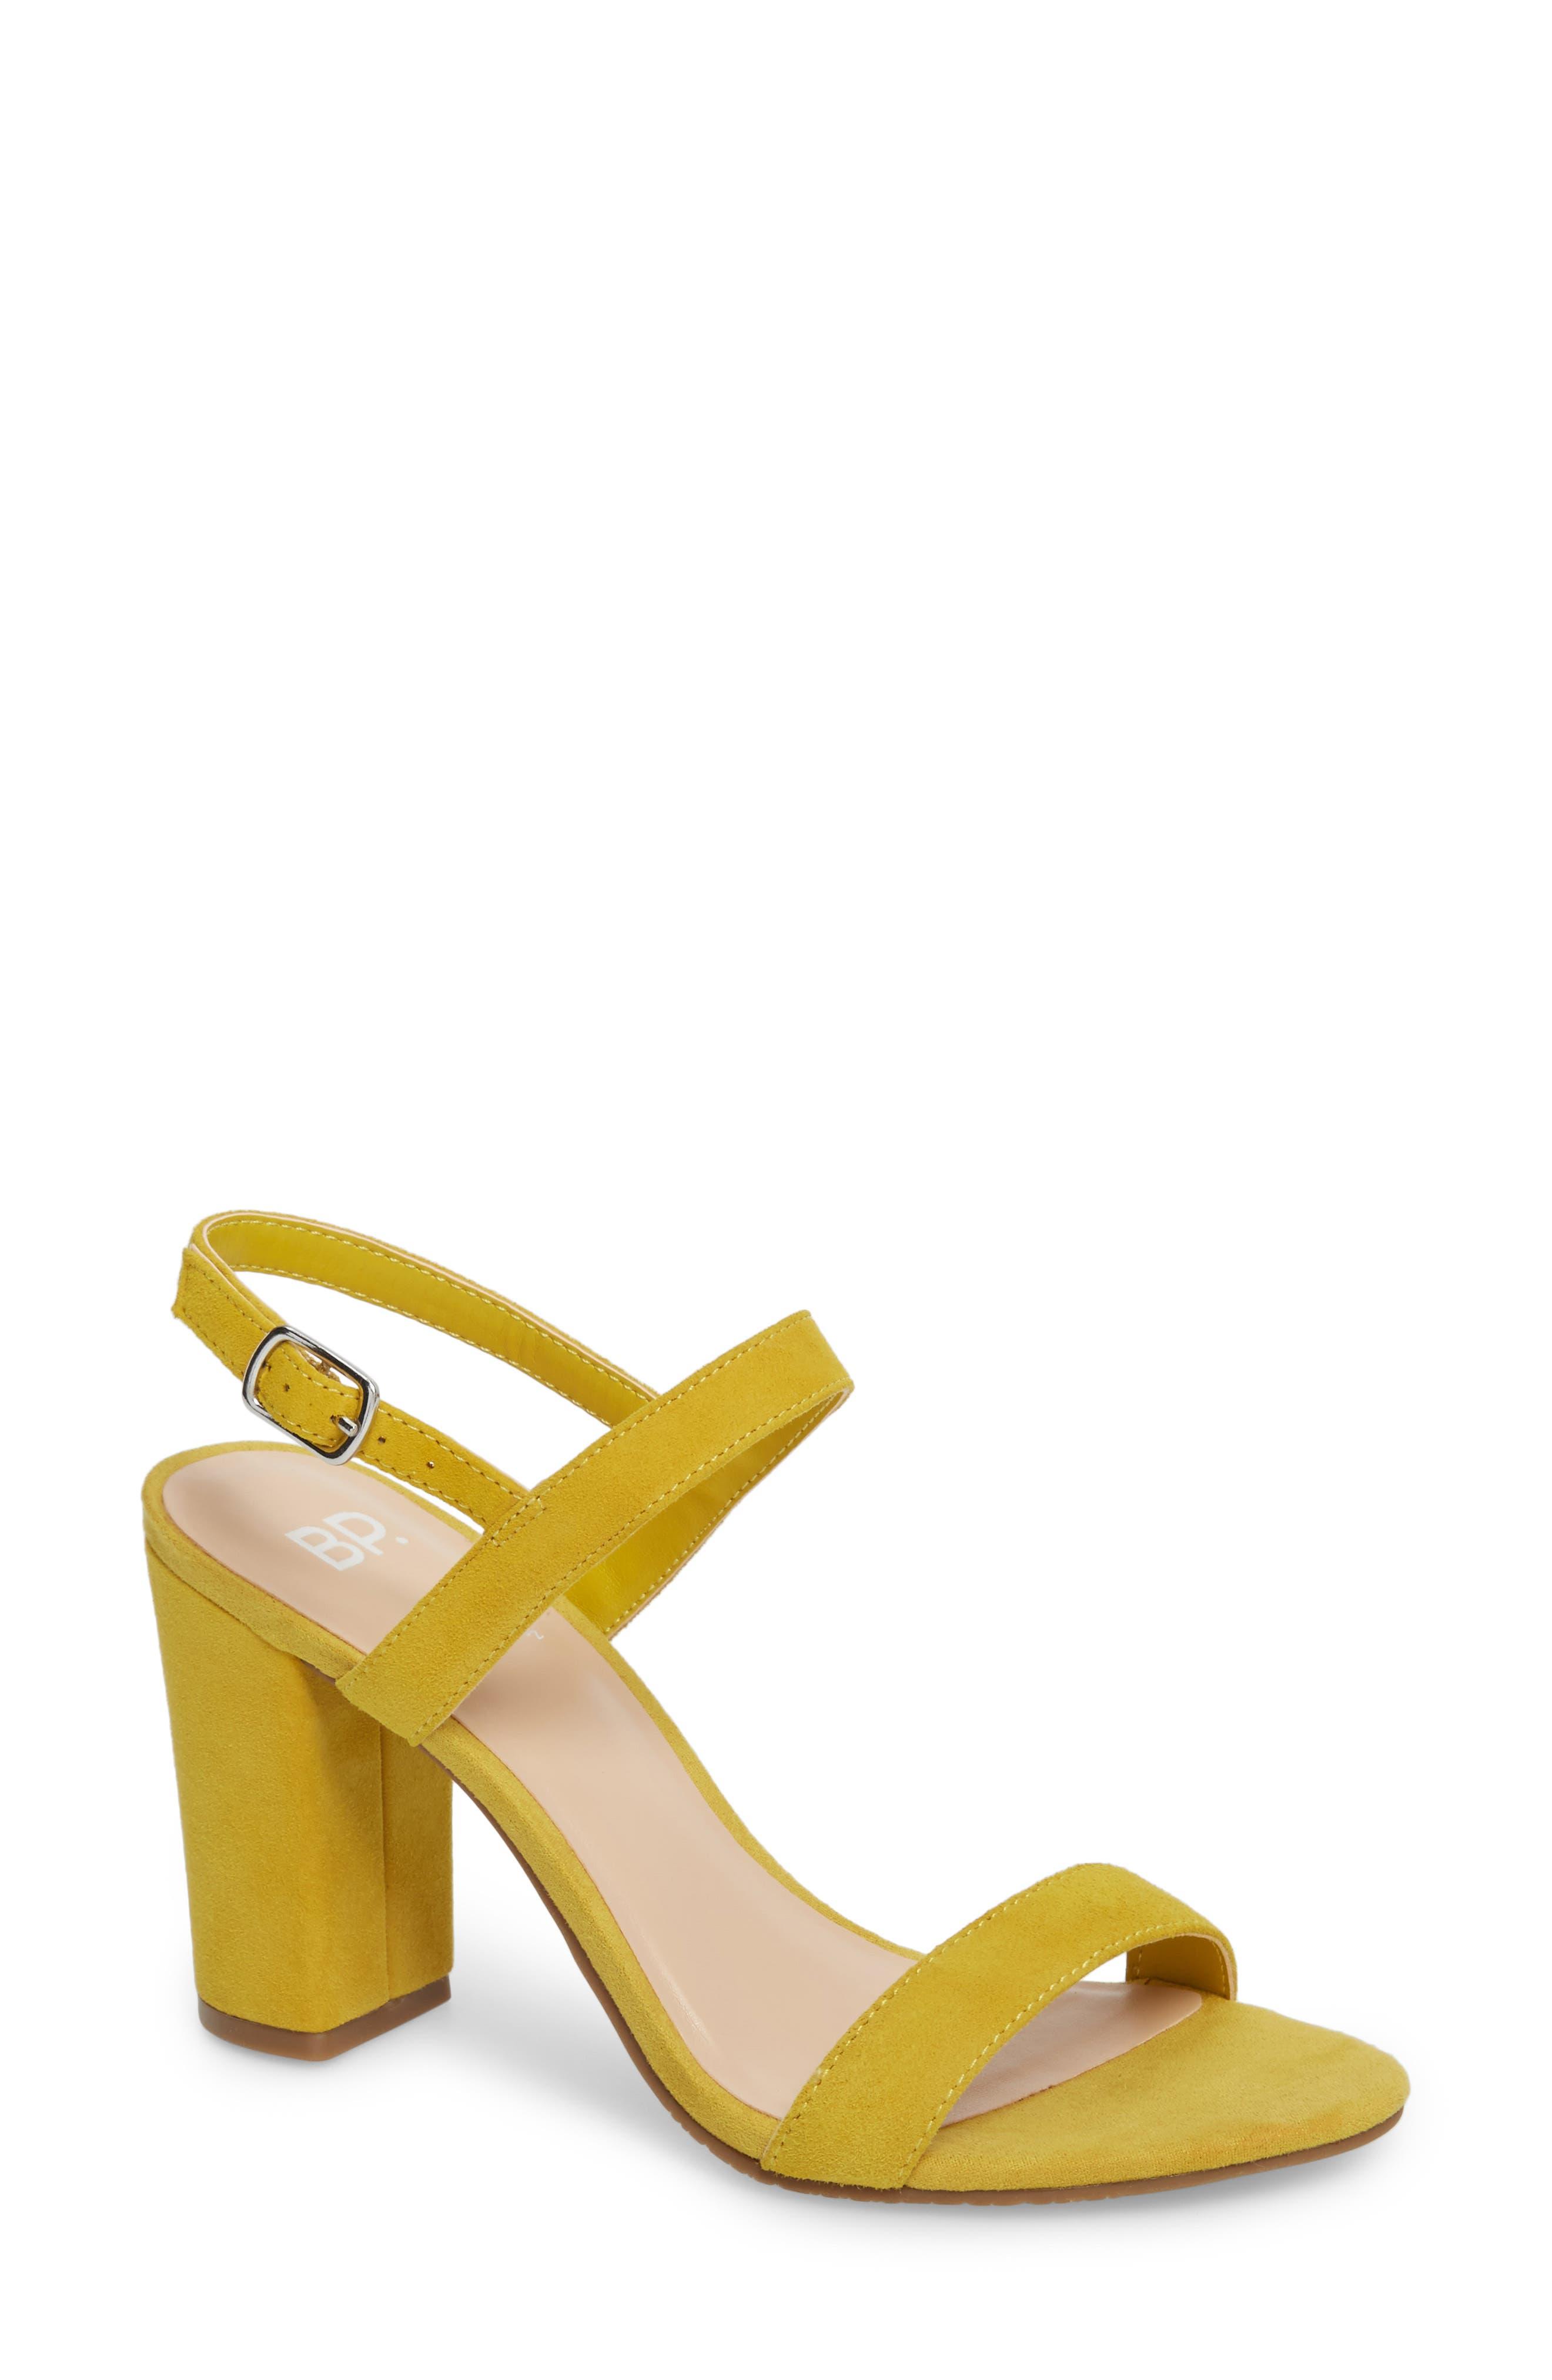 Lula Block Heel Slingback Sandal,                             Main thumbnail 1, color,                             Yellow Suede